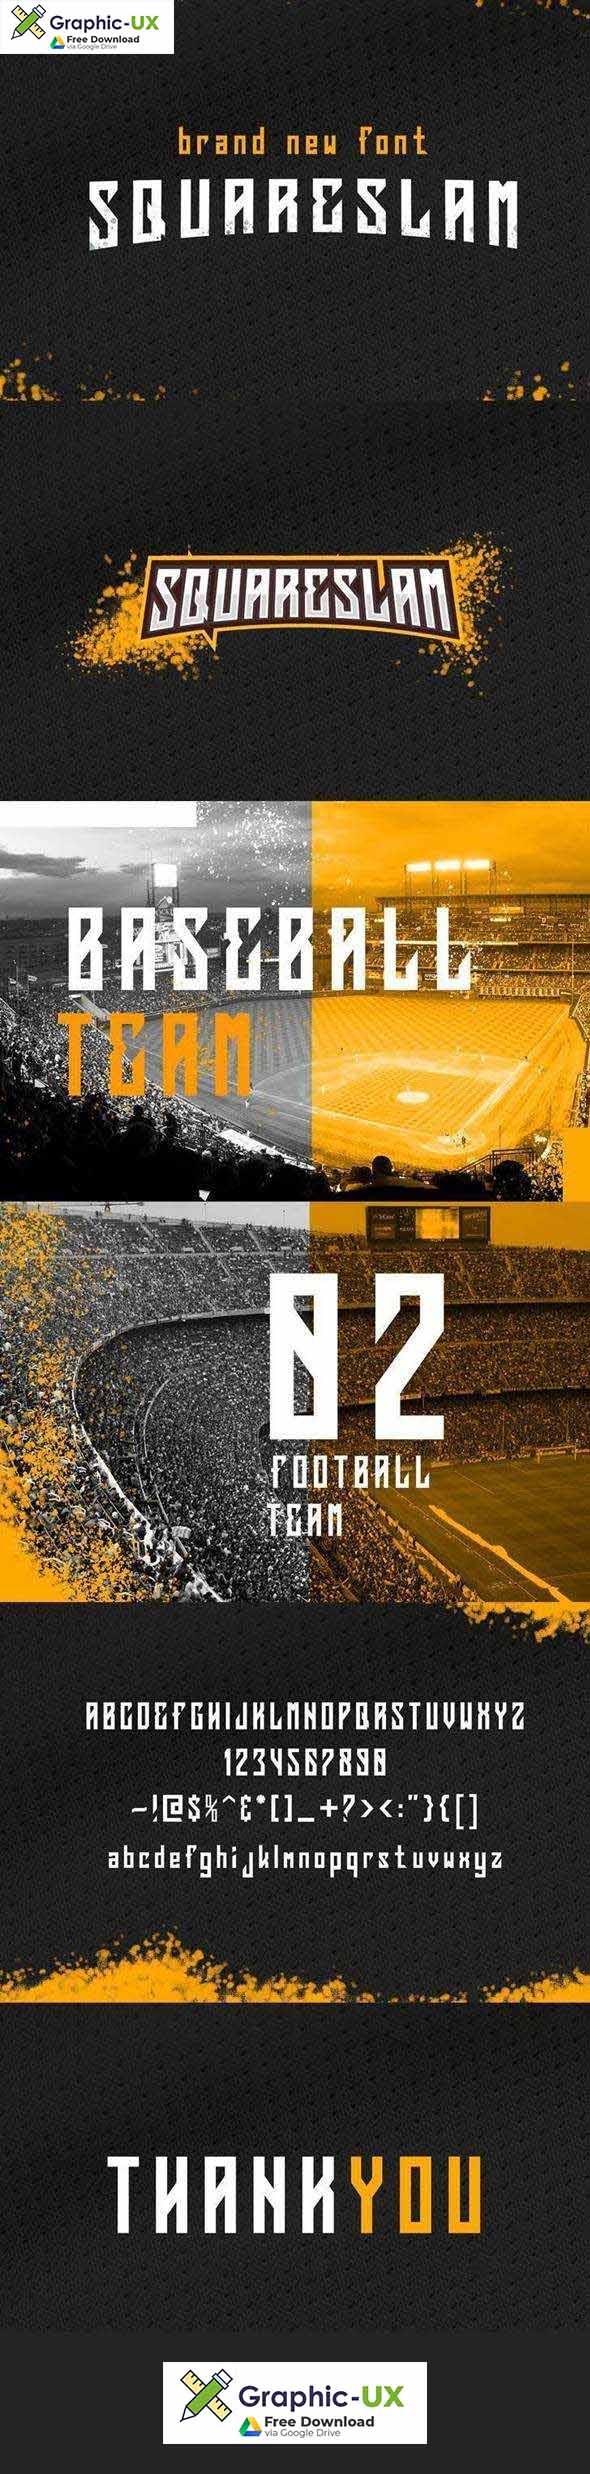 Squareslam sports and esports font